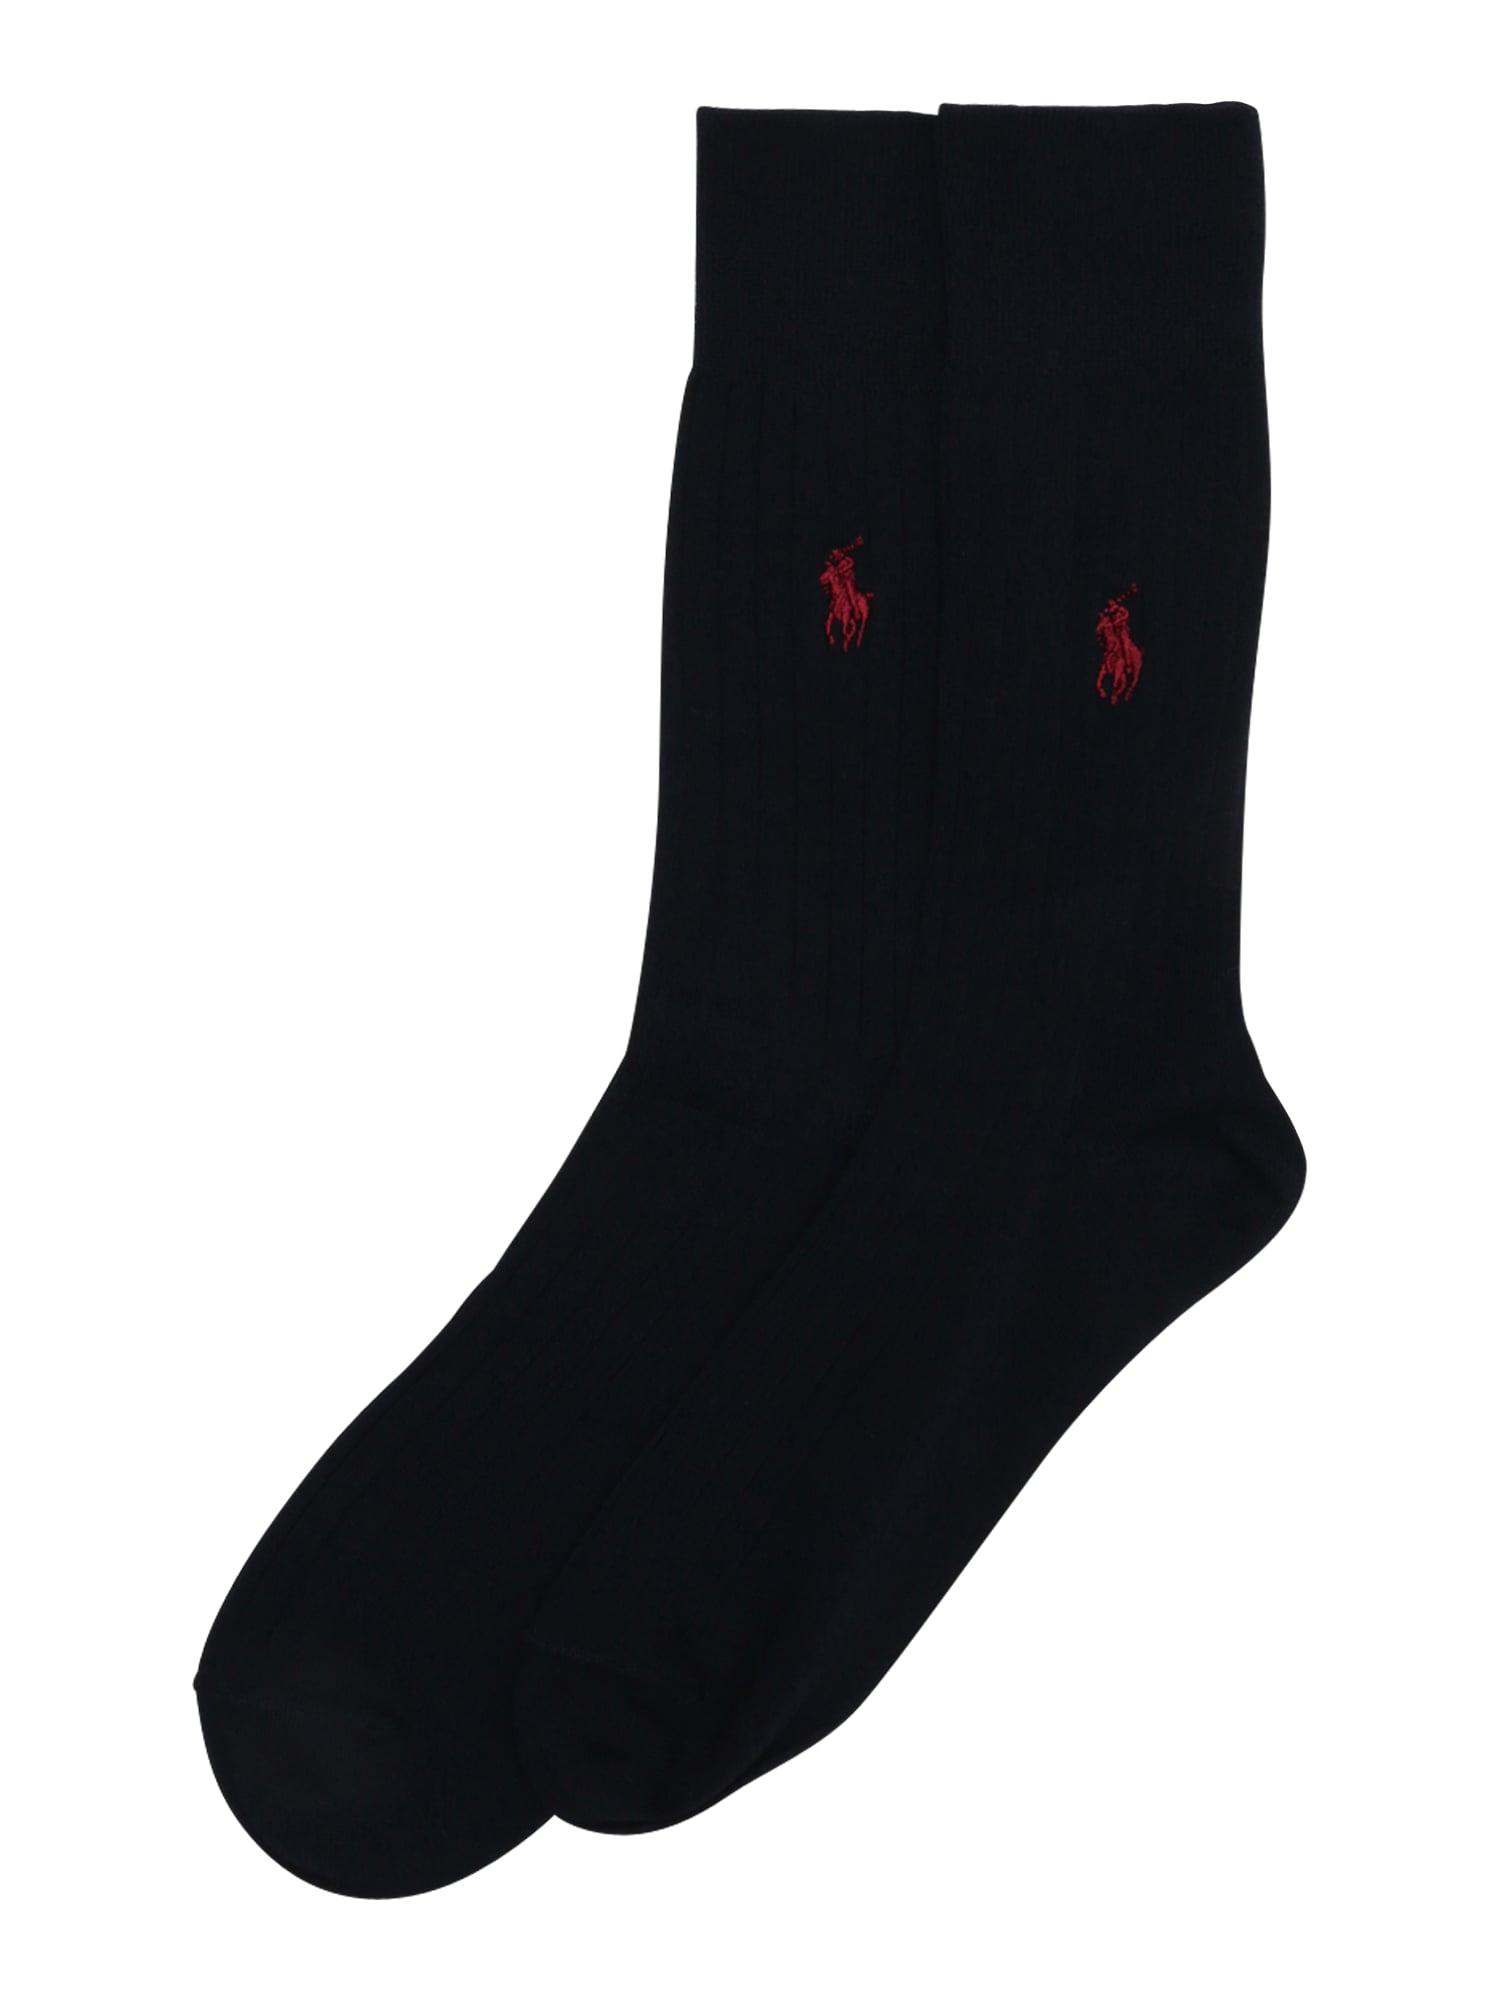 Ponožky ACTIVE SLACK-SOCKS-SINGLE tmavě modrá POLO RALPH LAUREN